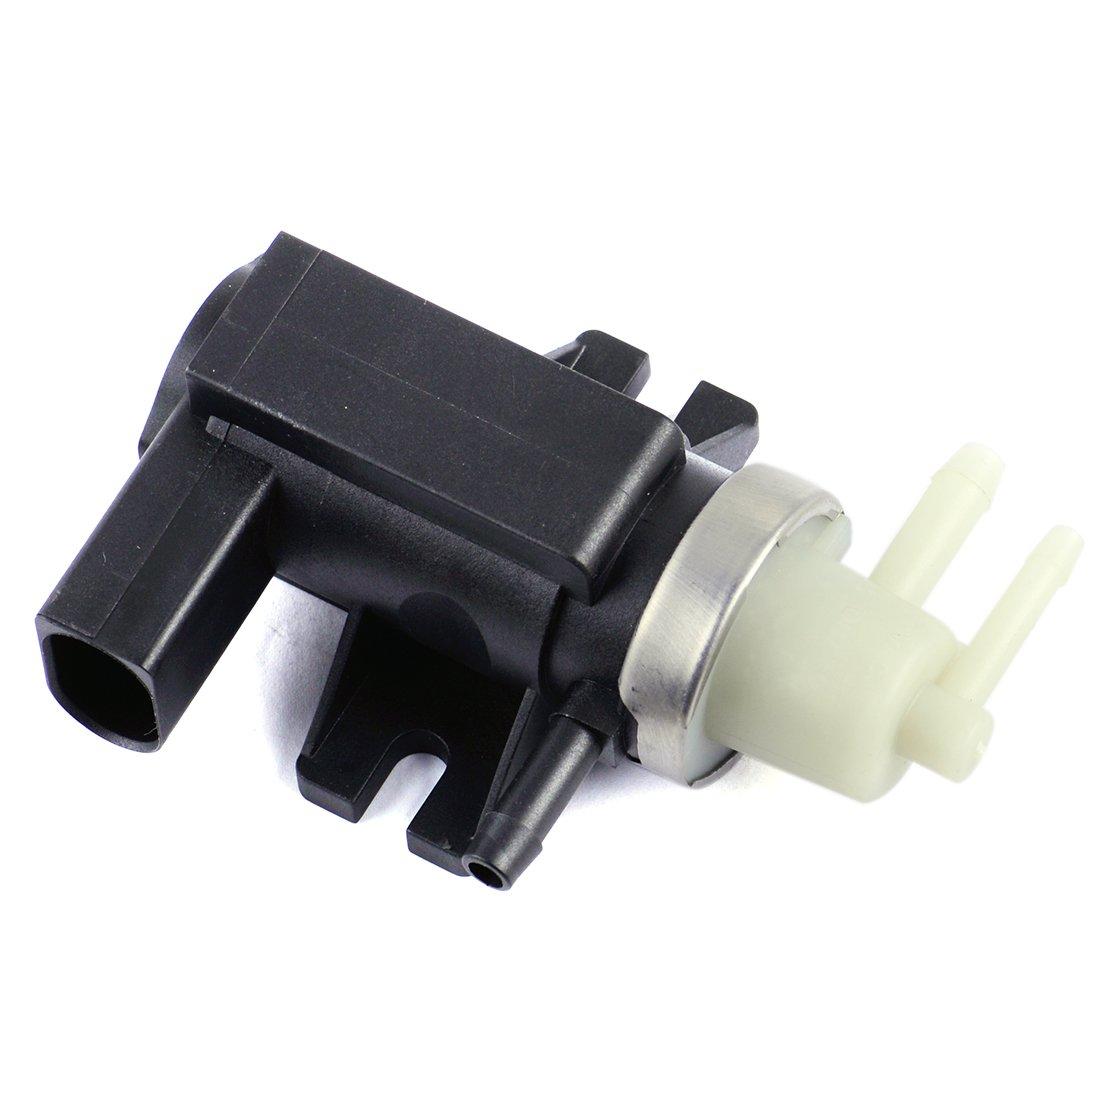 CITALL 1H0906627A Turbo Ladedruck Magnetventil sitao